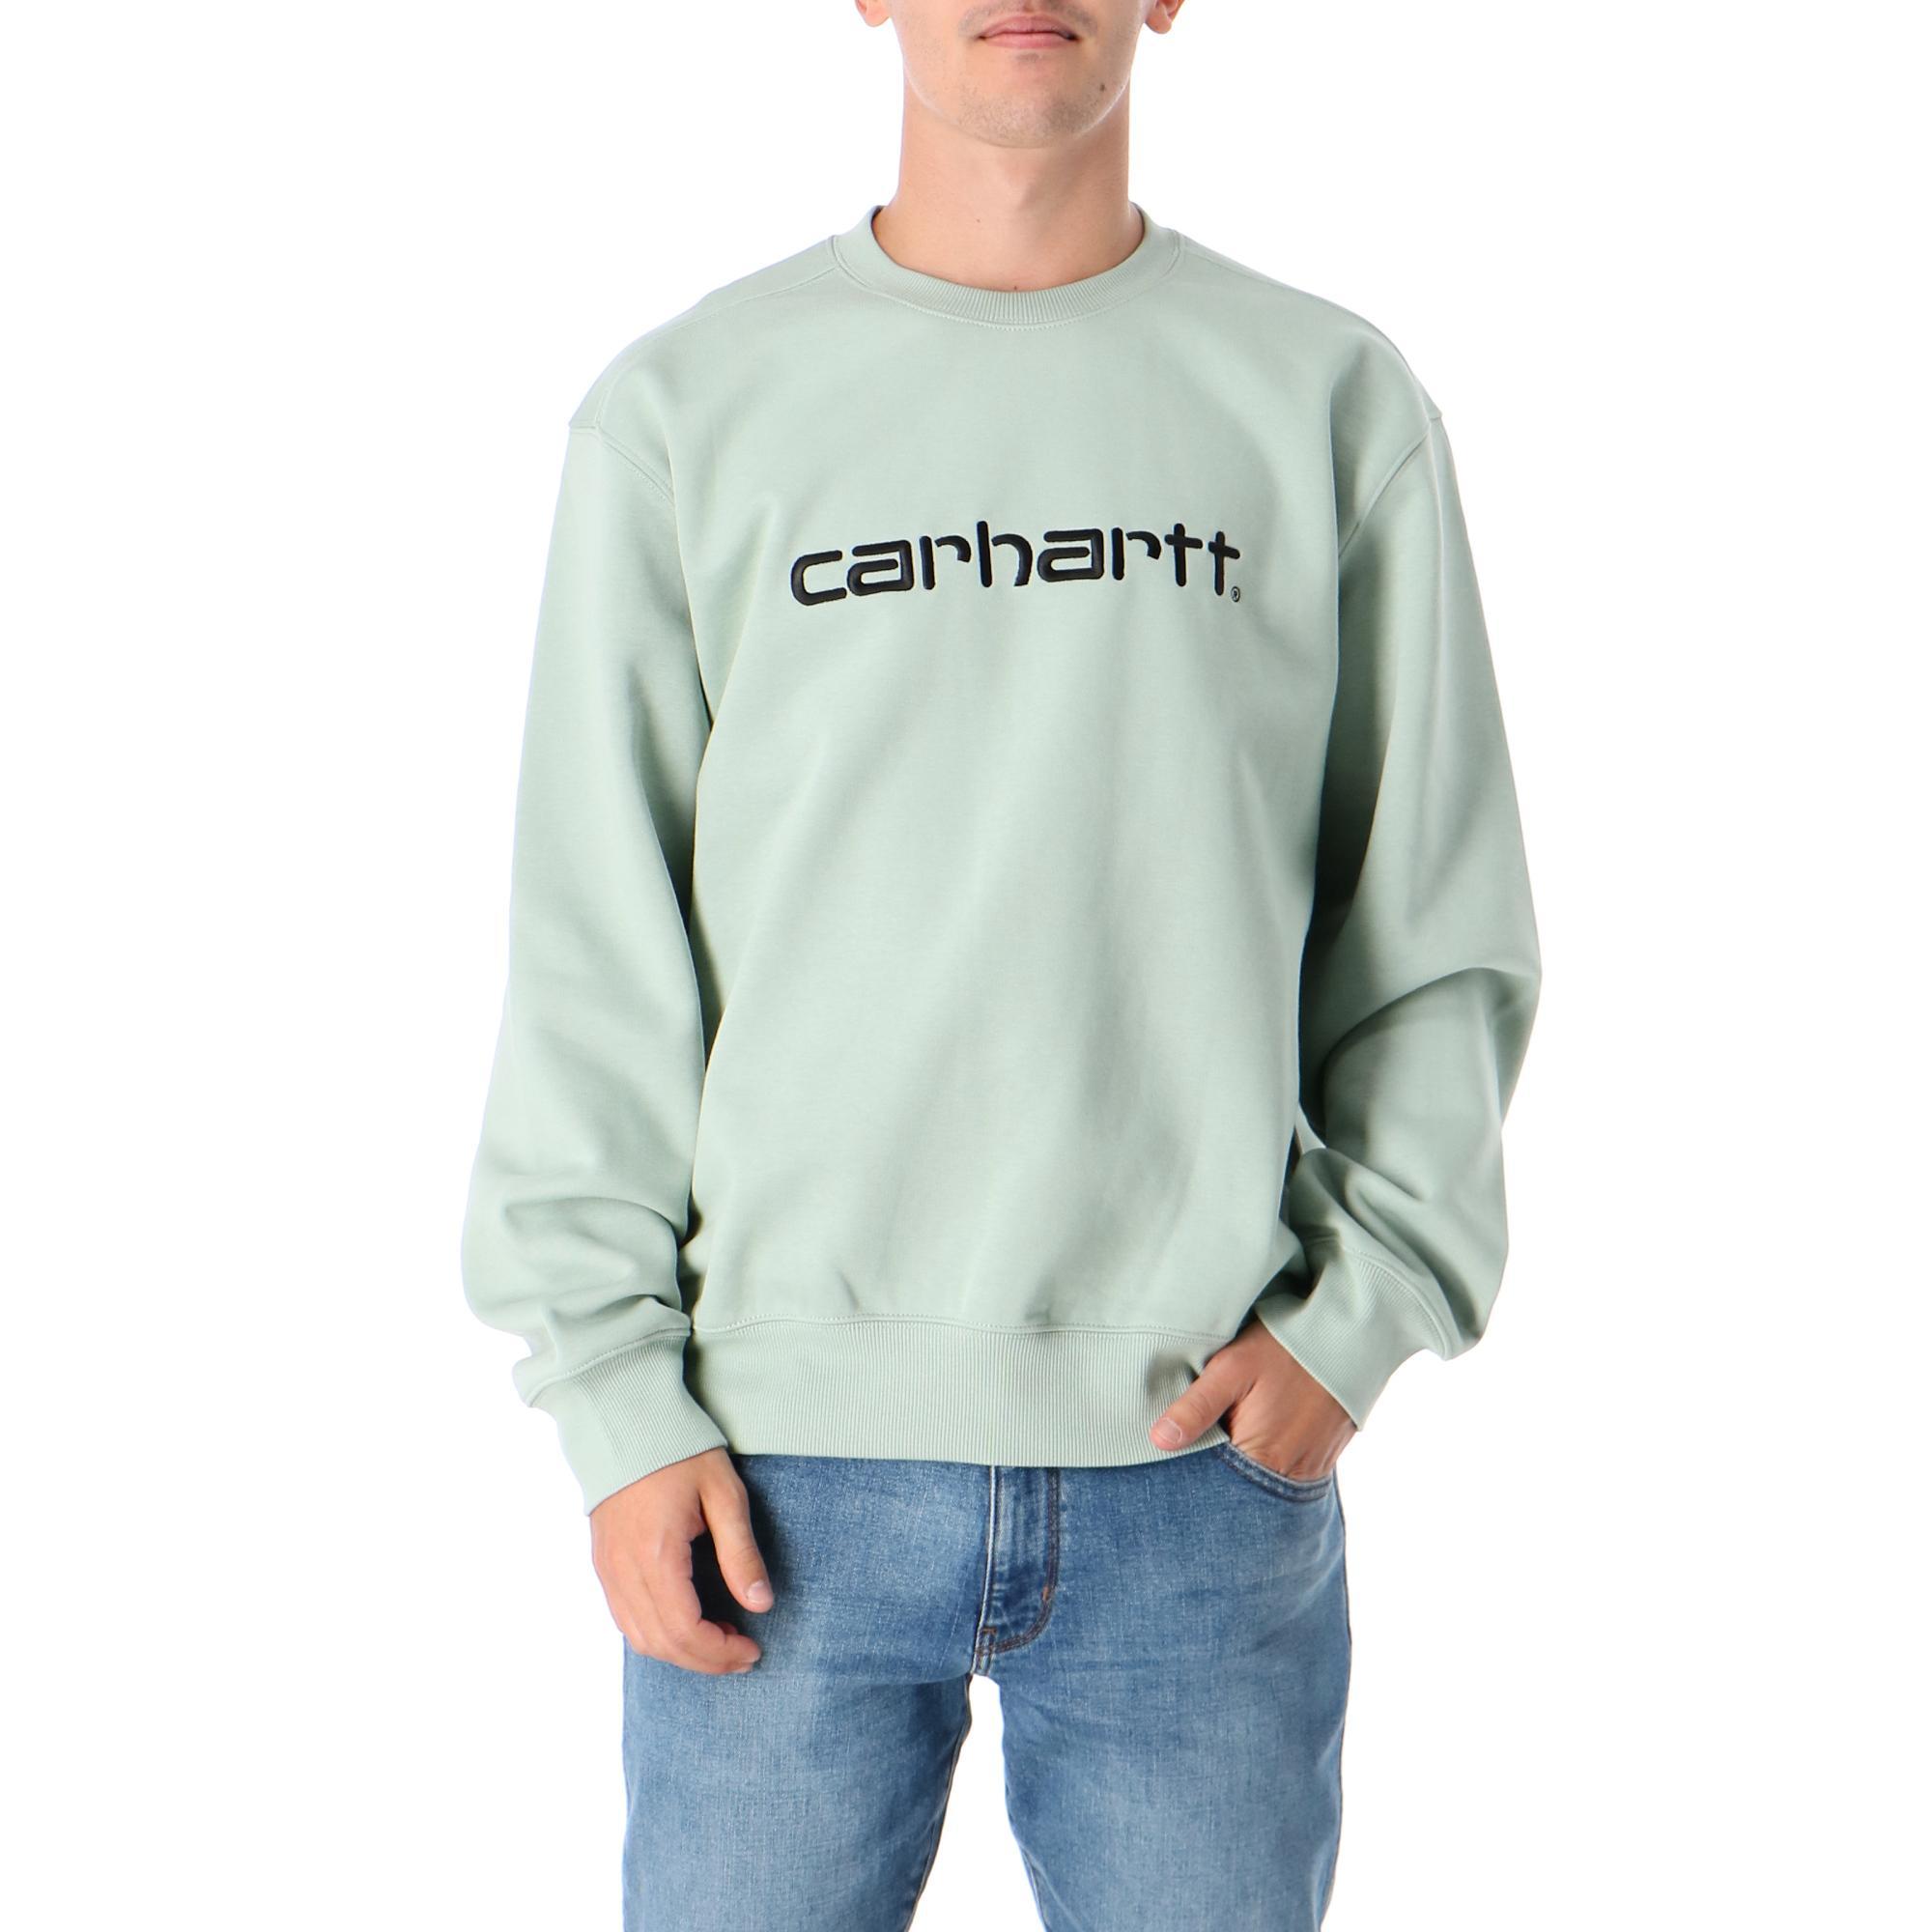 Carhartt Sweatshirt<br/> Frosted green black